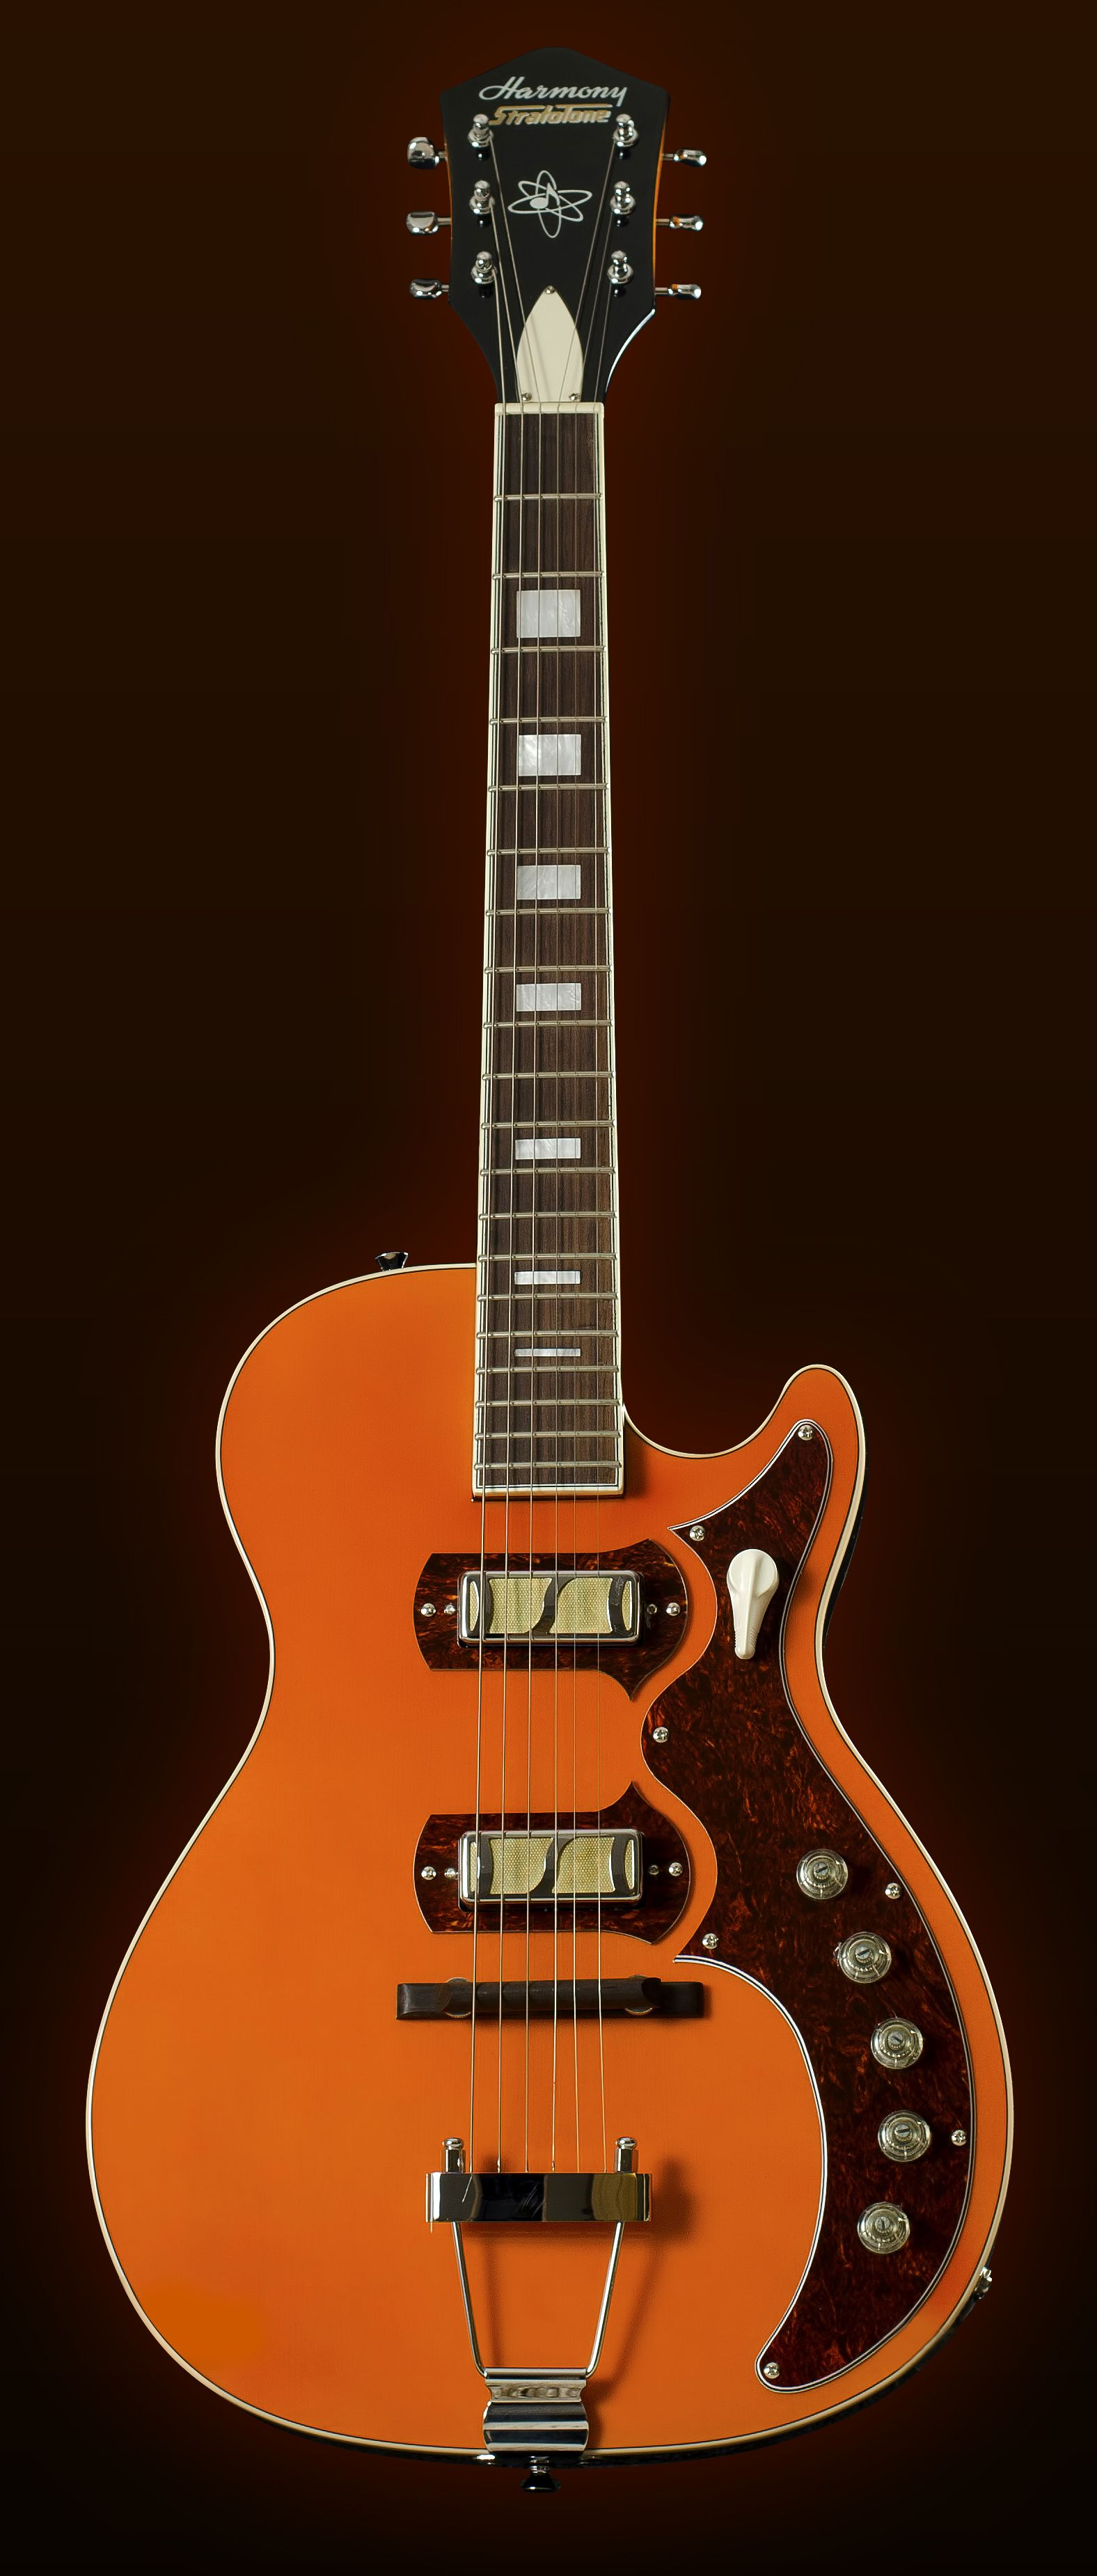 harmony h49 jupiter stratotone guitars amplifiers guitar harmony guitars vintage guitars. Black Bedroom Furniture Sets. Home Design Ideas